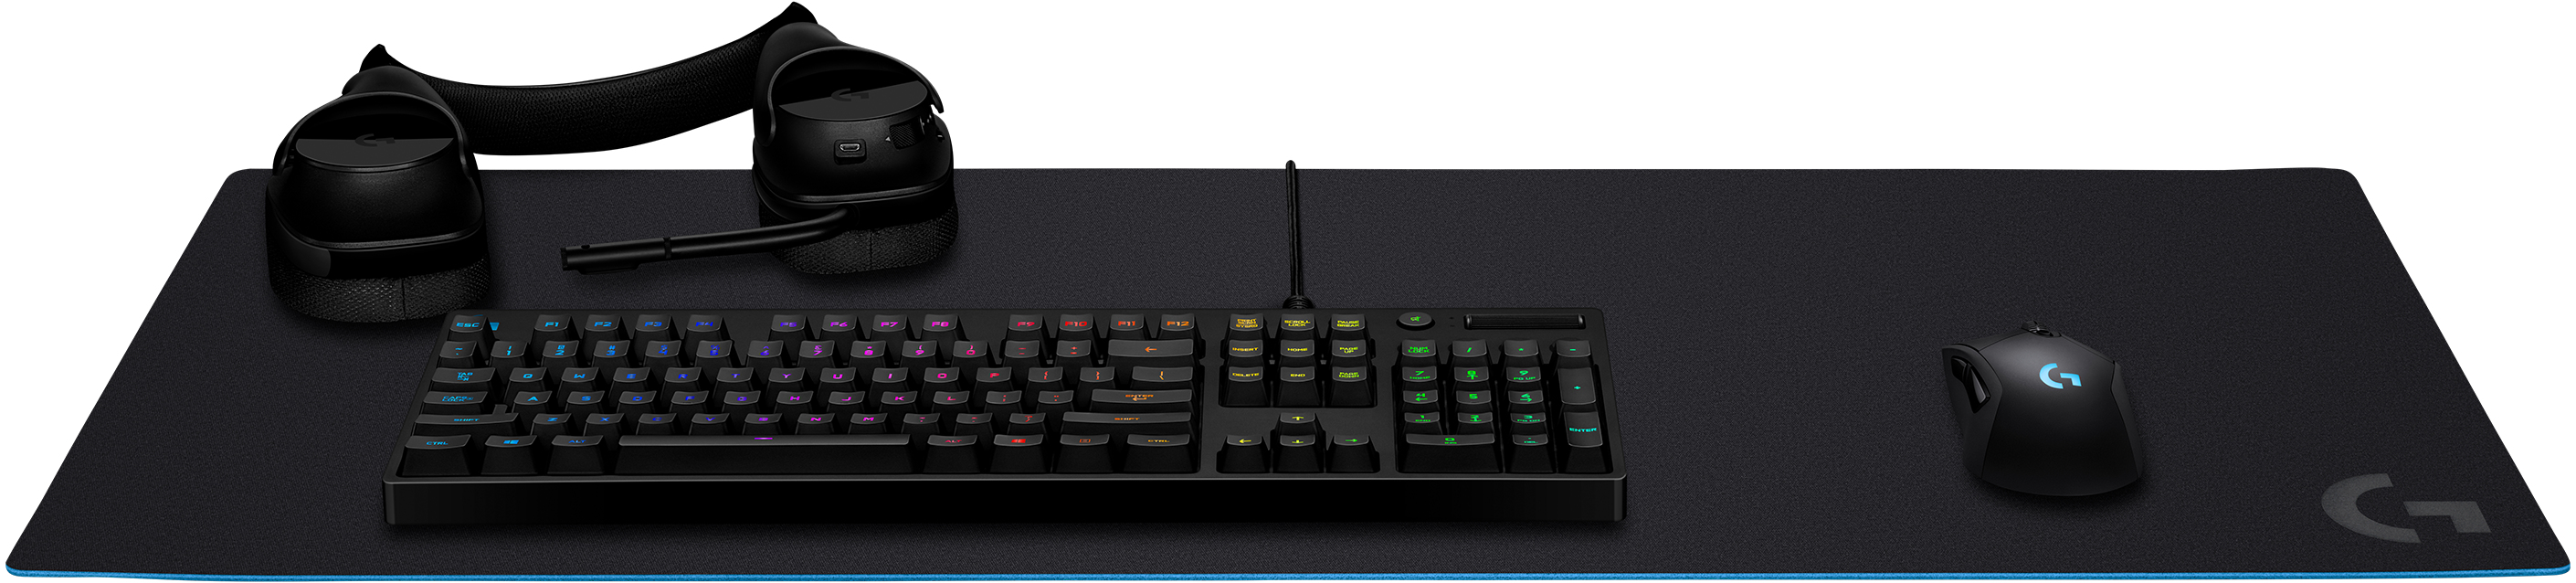 G840 XL Gaming Mouse Pad (400 x 900 x 3 mm, rubber, zwart)